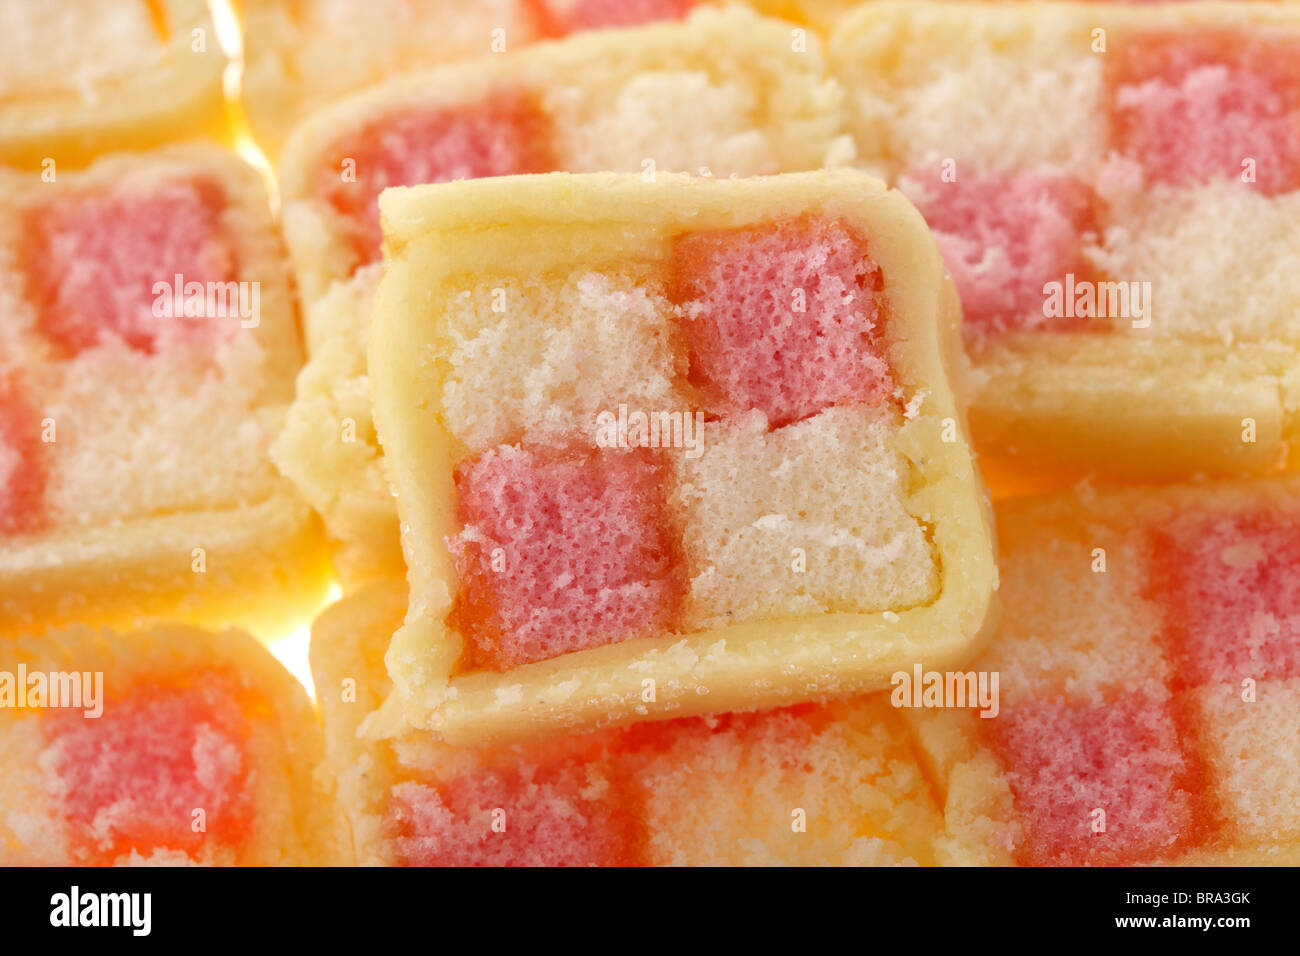 cross section of mini battenberg cake - Stock Image